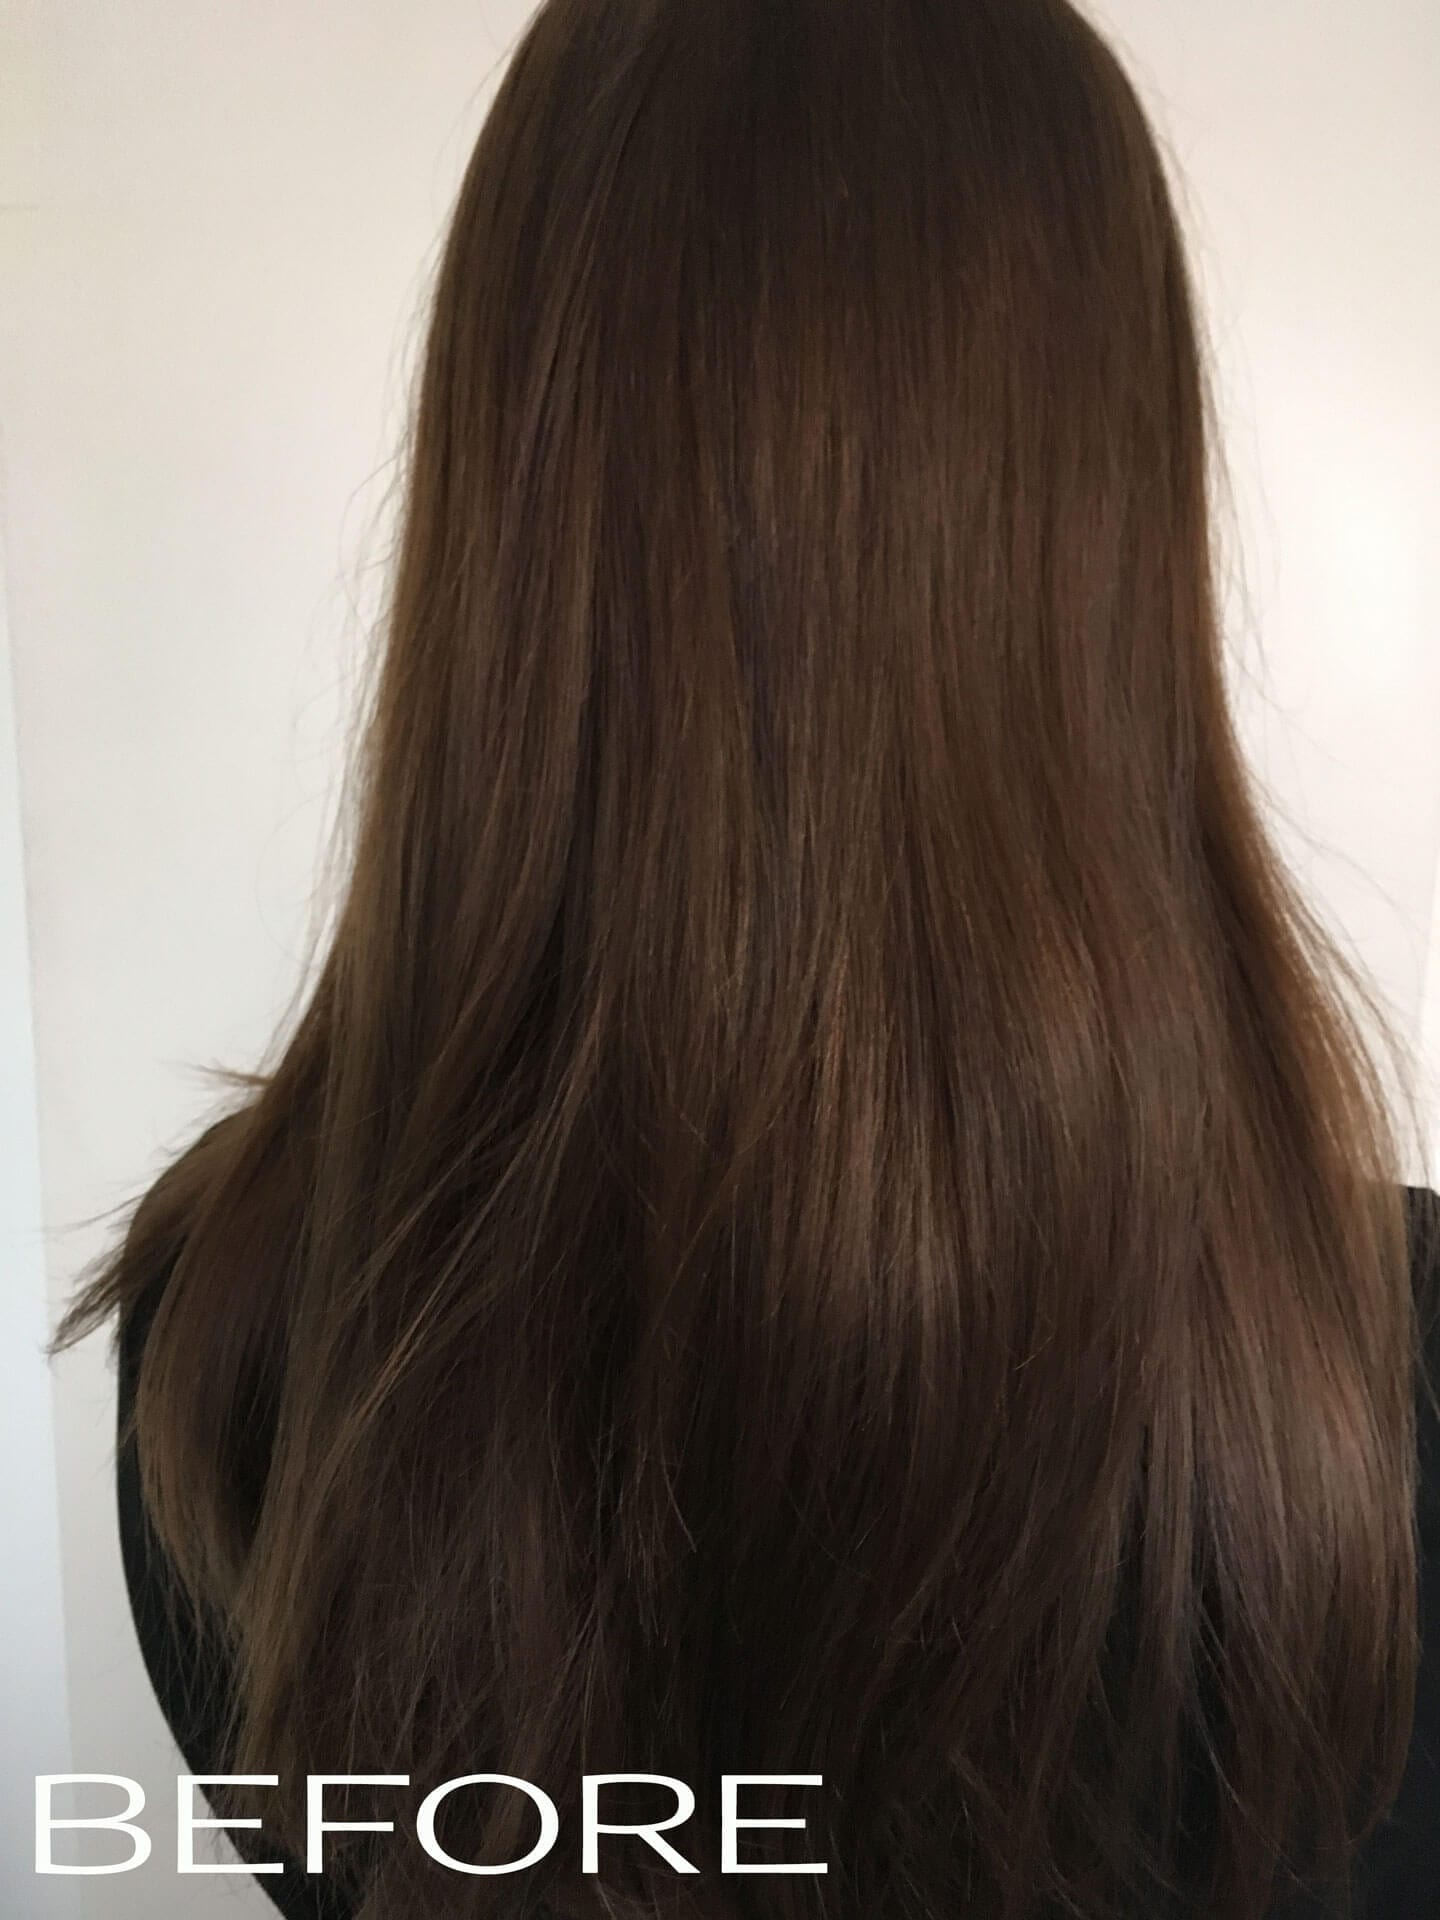 Hair dye review: turning dark brown into dark blonde